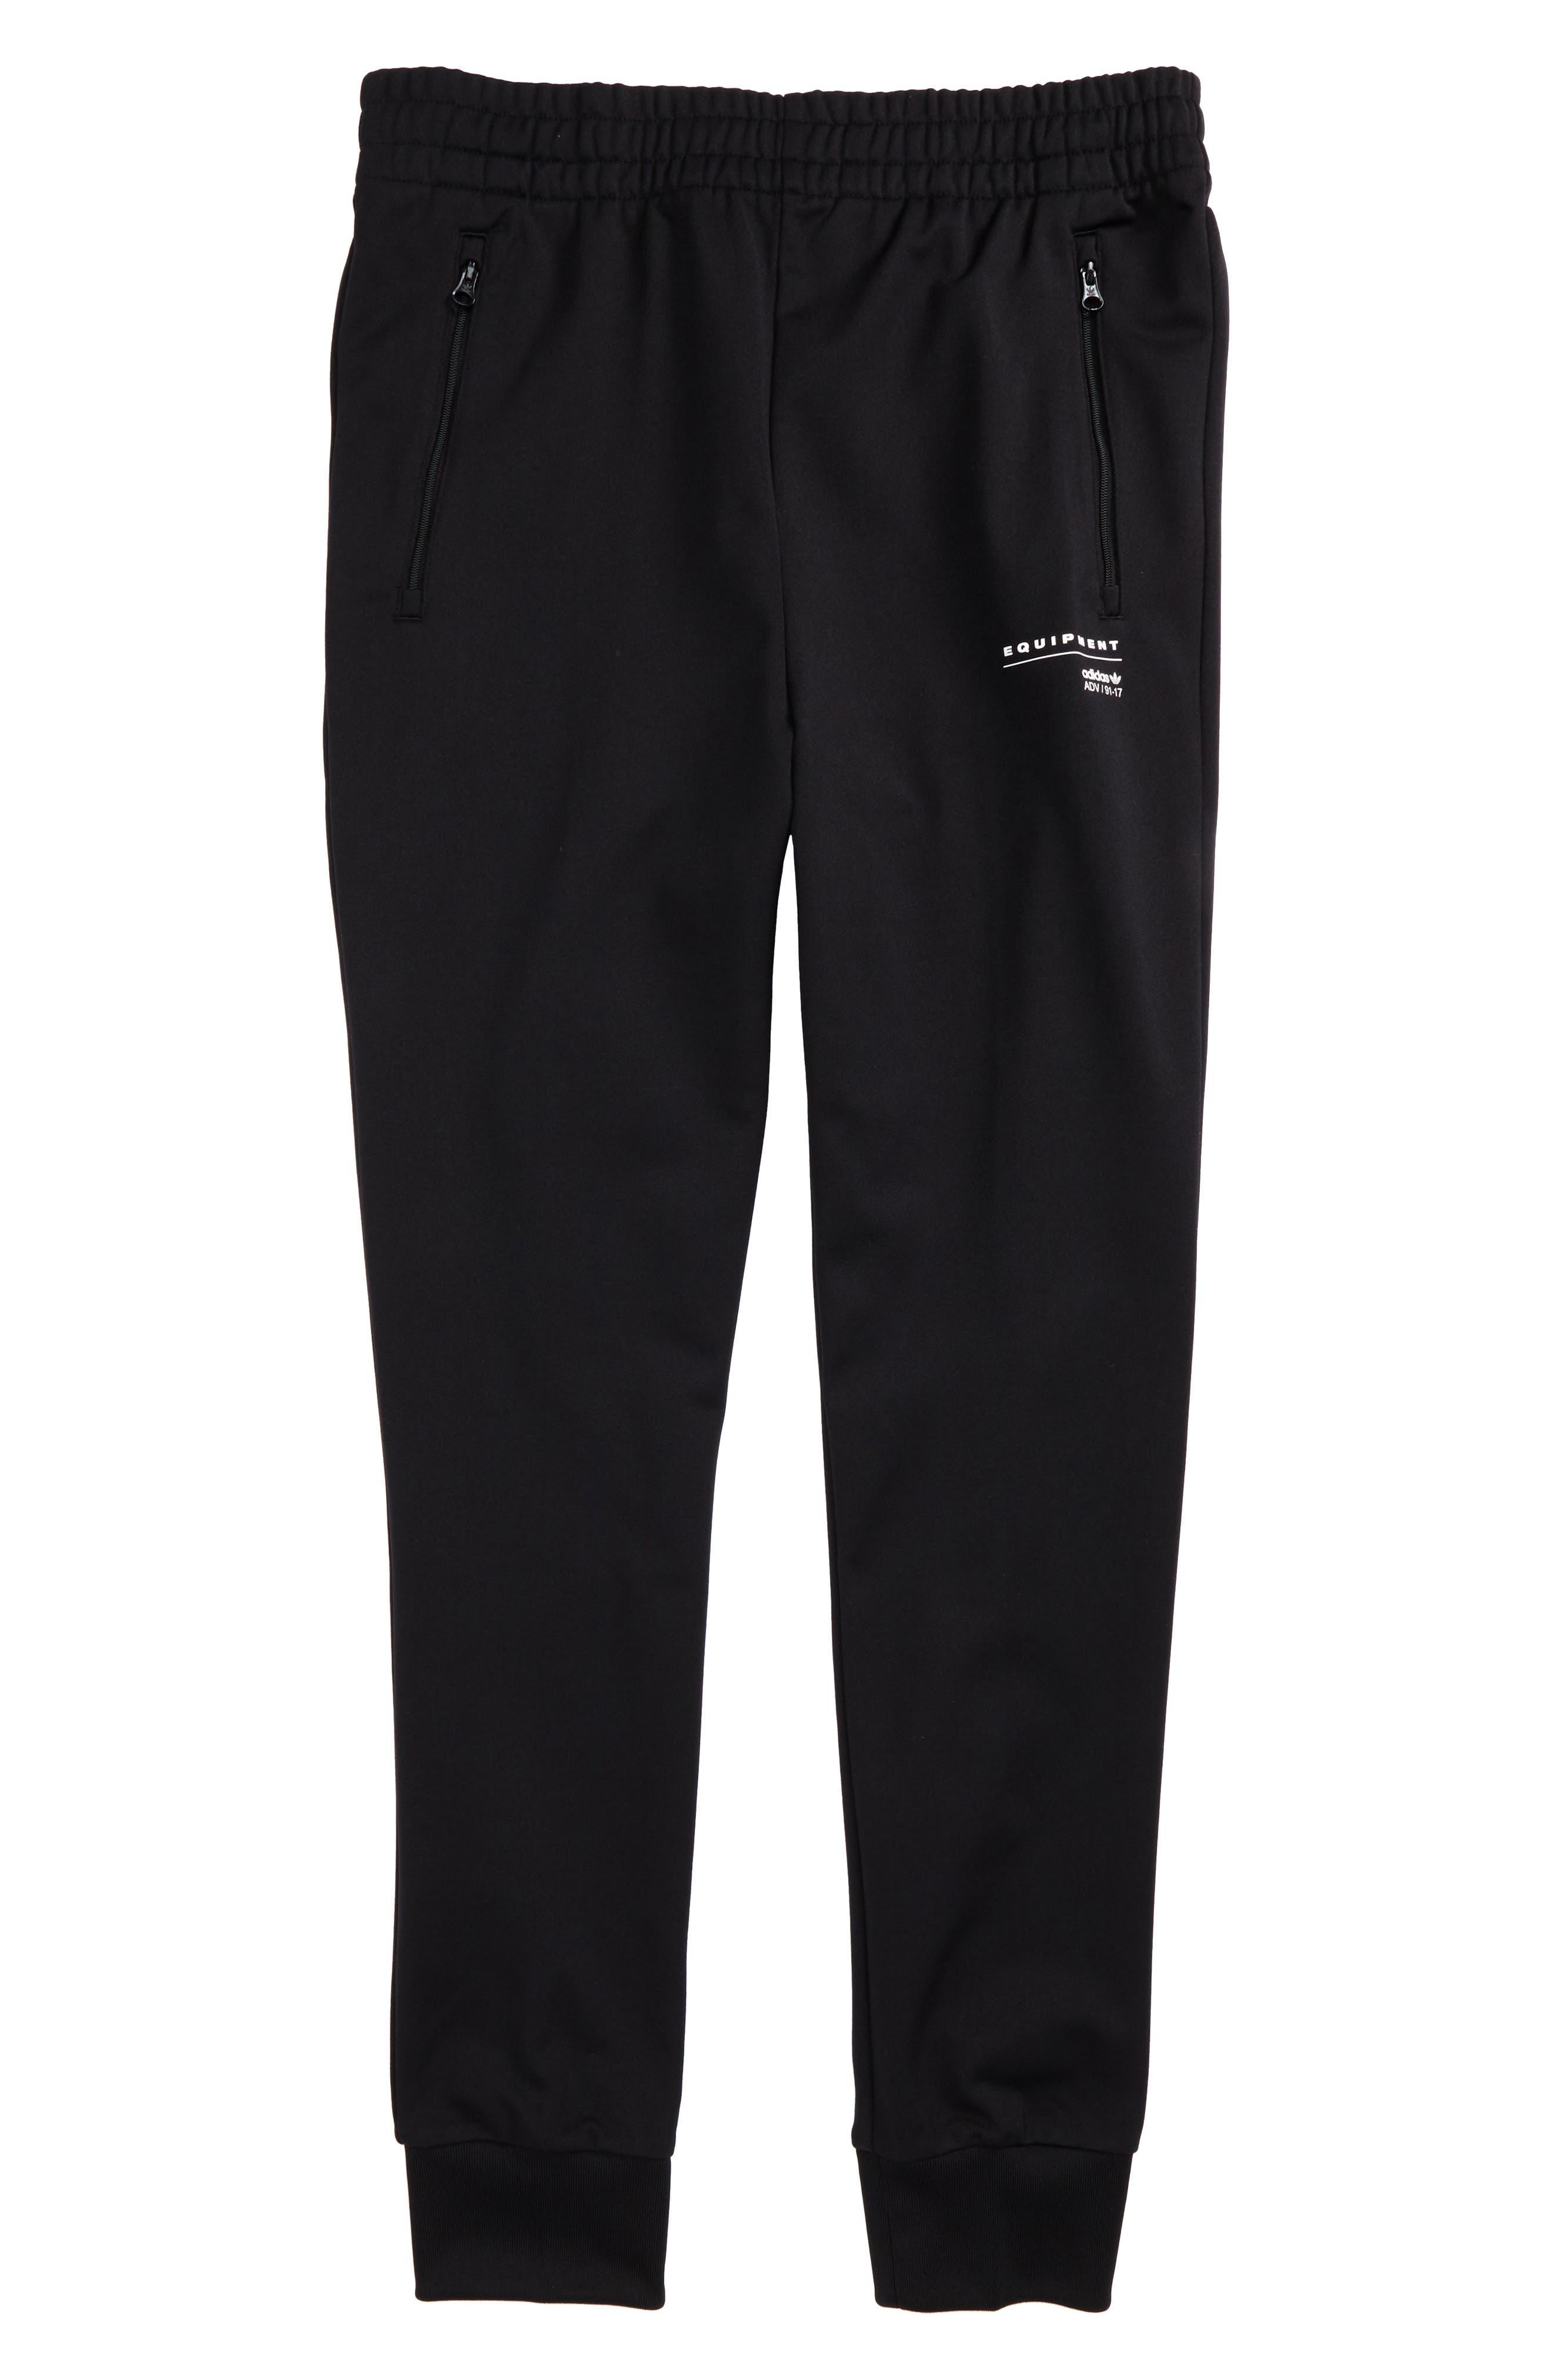 Main Image - adidas Originals EQT Tiro Track Pants (Little Boys & Big Boys)